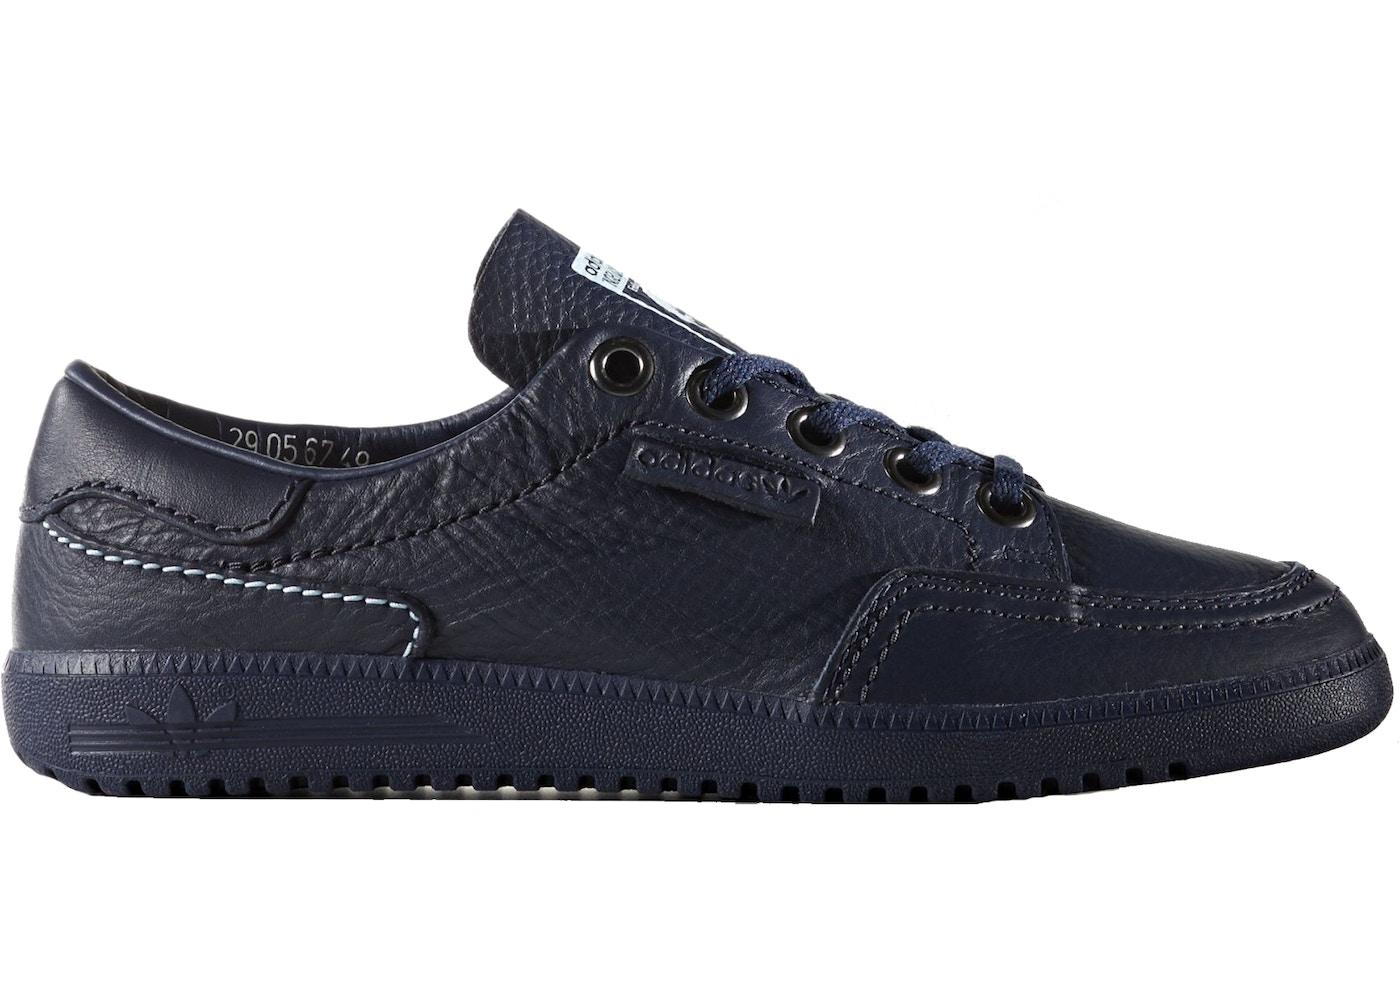 new style b04ae 39877 Sell. or Ask. Size 10. View All Bids. adidas Garwen SPZL Noel Gallagher  Night Indigo